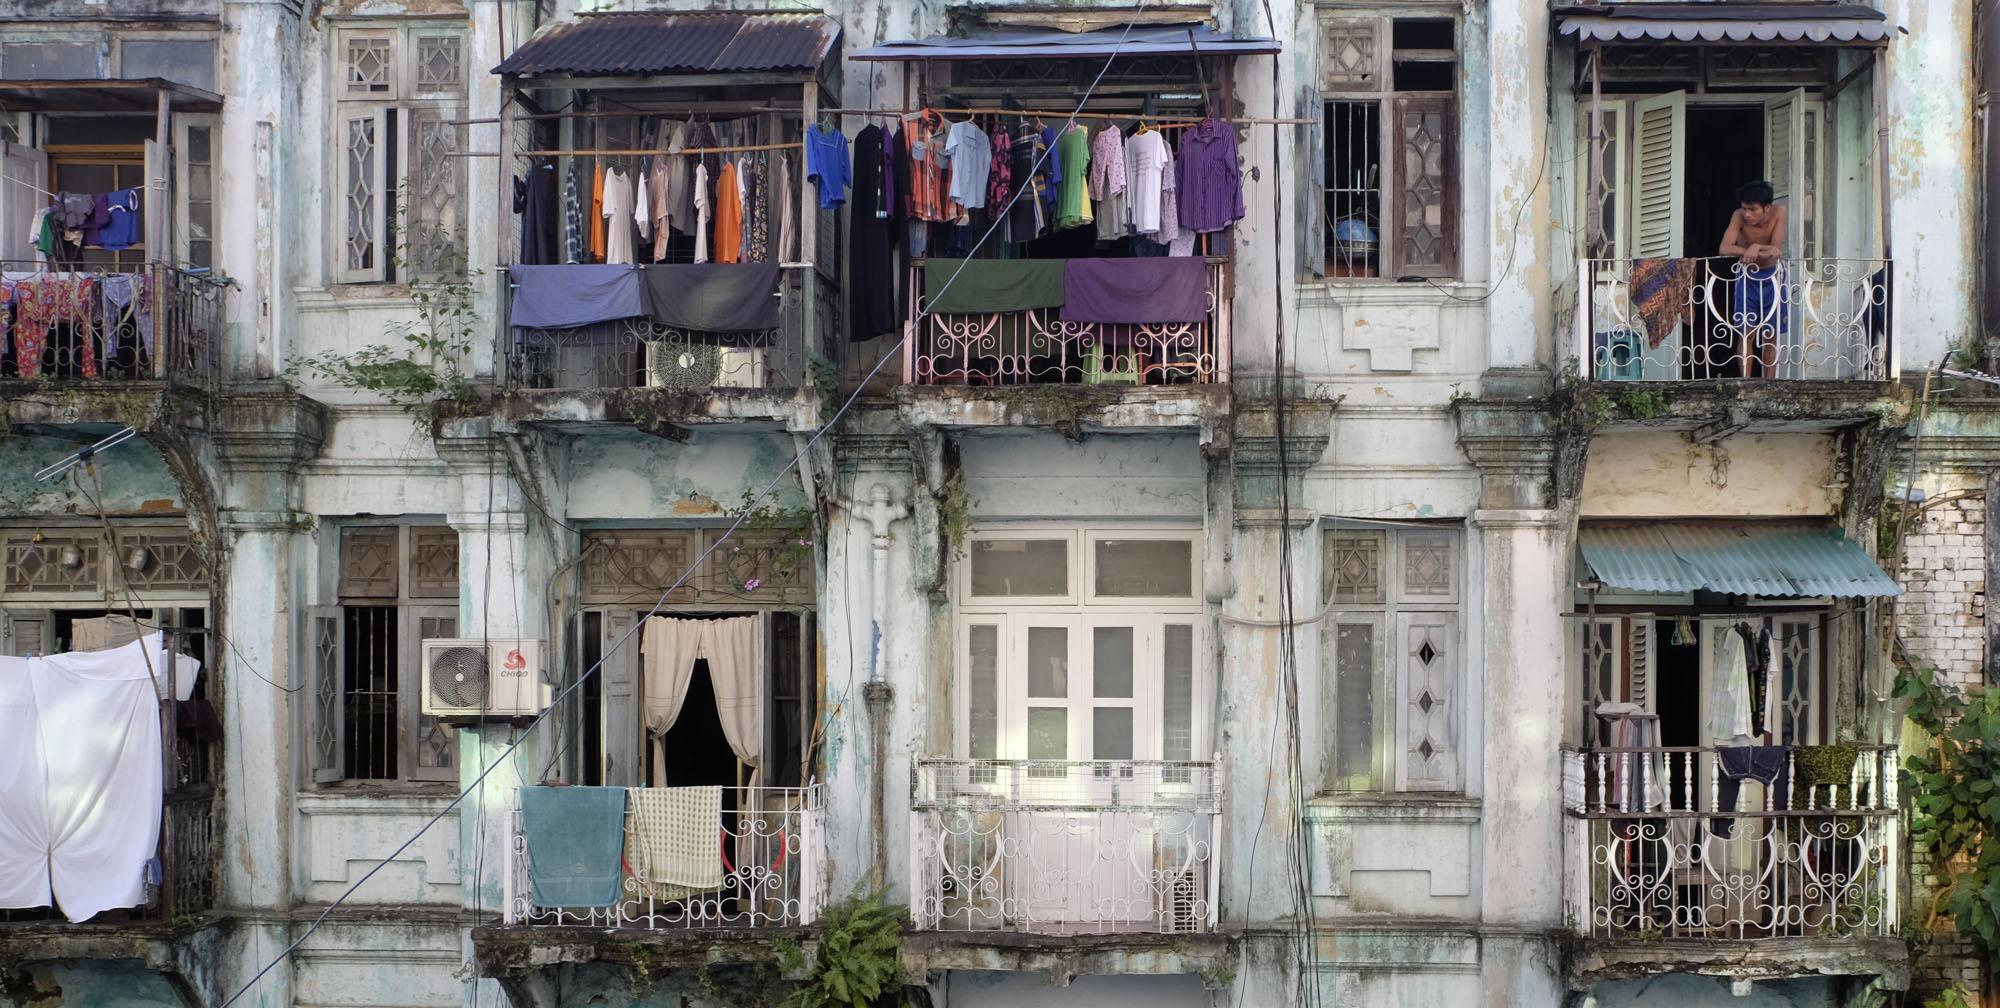 reise-ansichten Yangon Altstadt